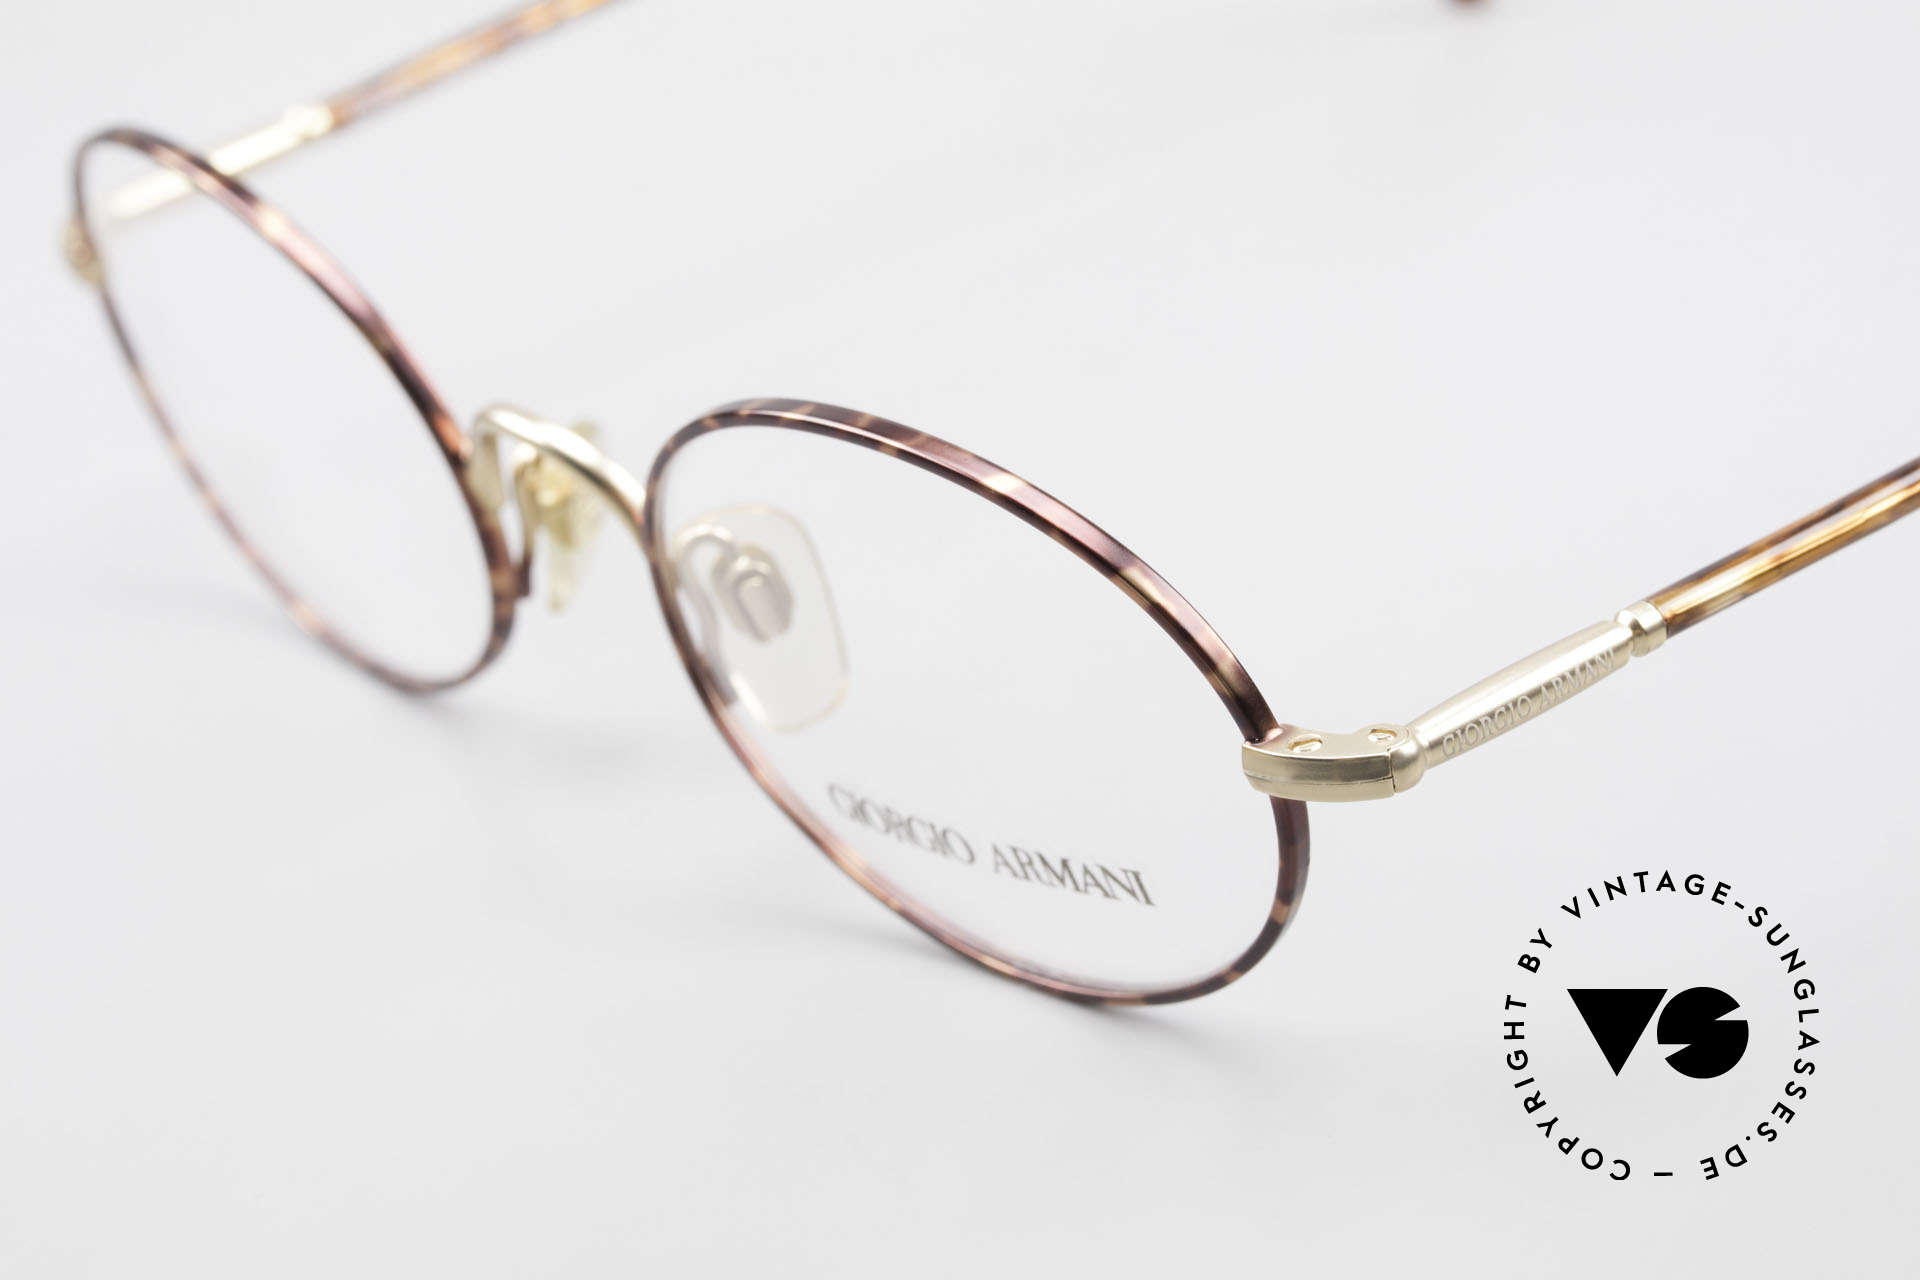 Giorgio Armani 189 Classic Oval Designer Frame, unworn rarity (like all our vintage designer frames), Made for Men